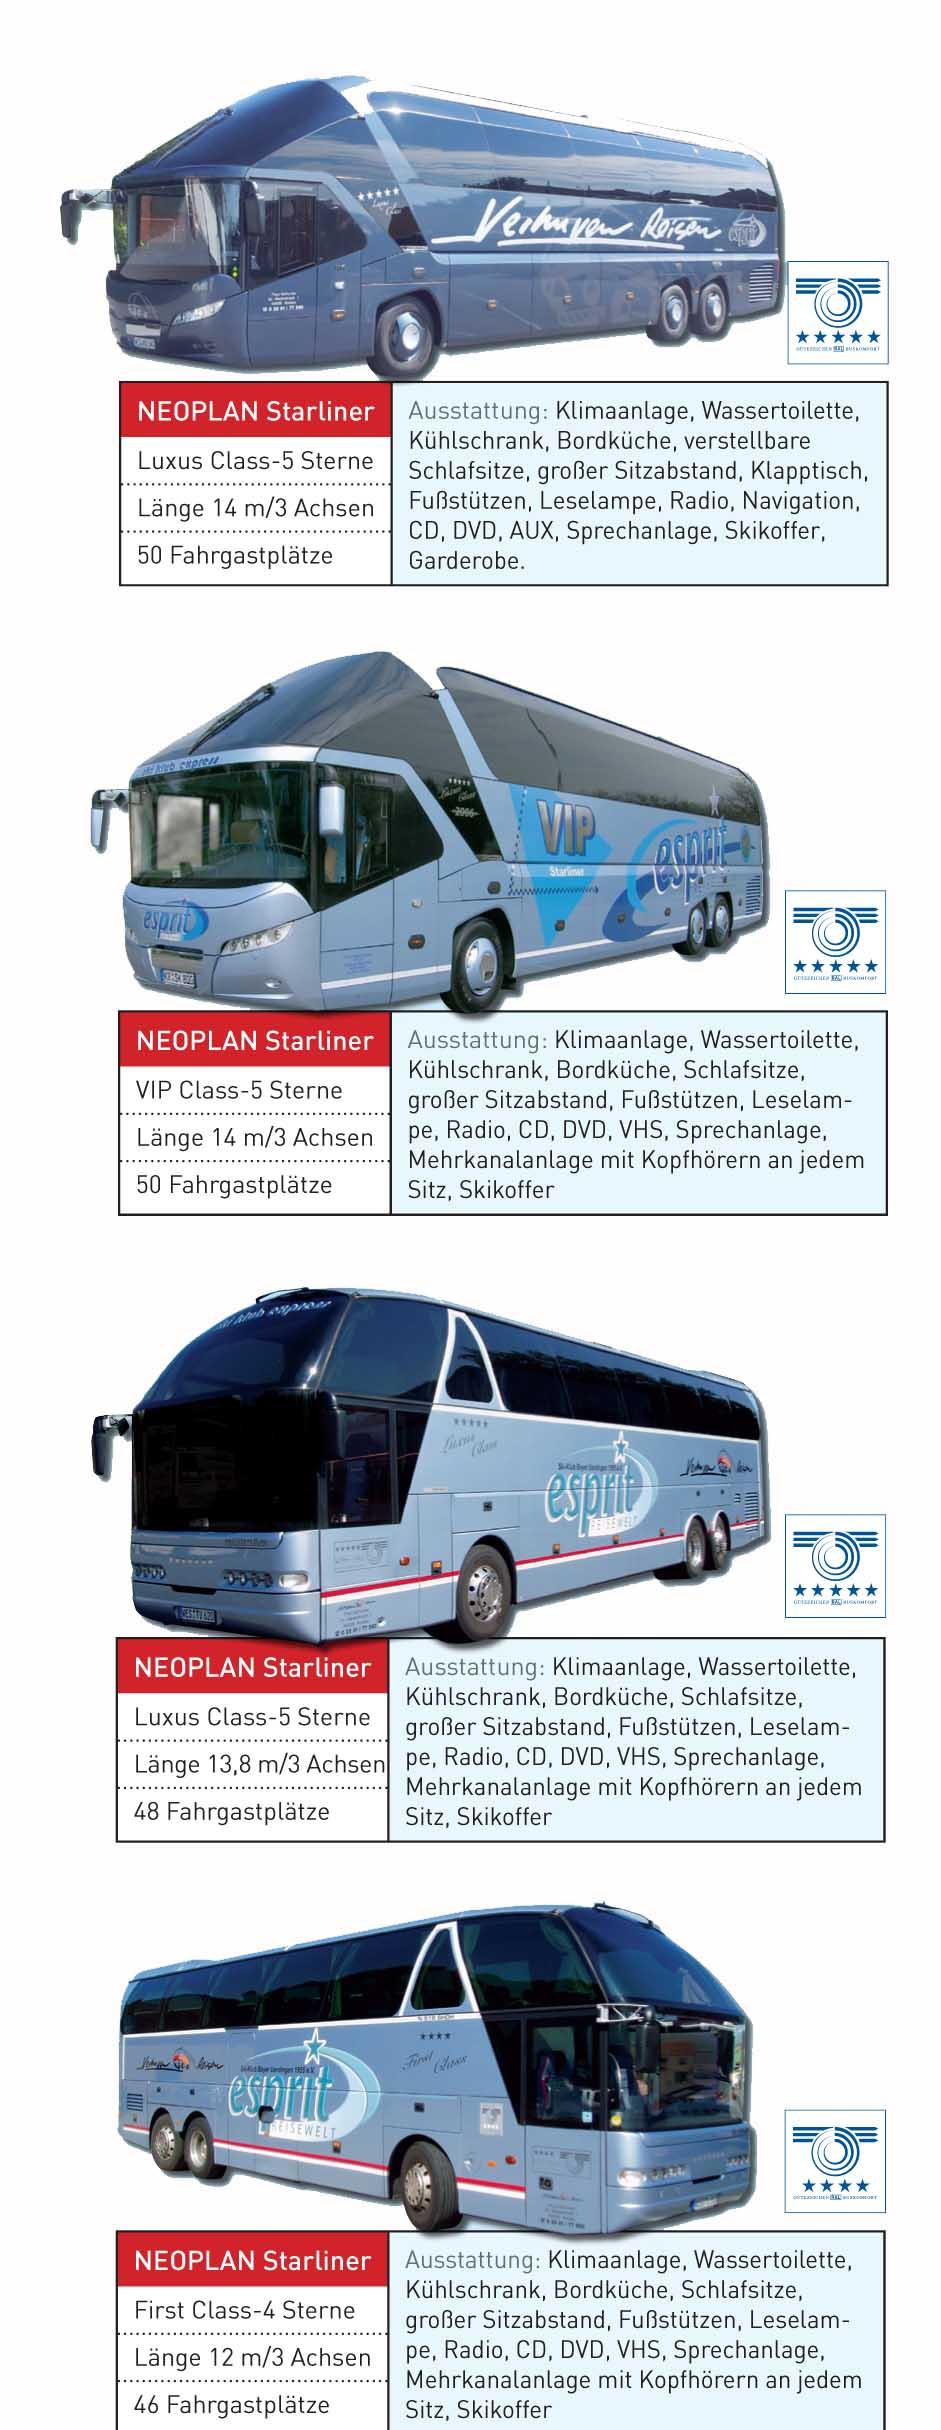 00 Espritreisen_Katalog_FINAL-44_bearbeitet-1